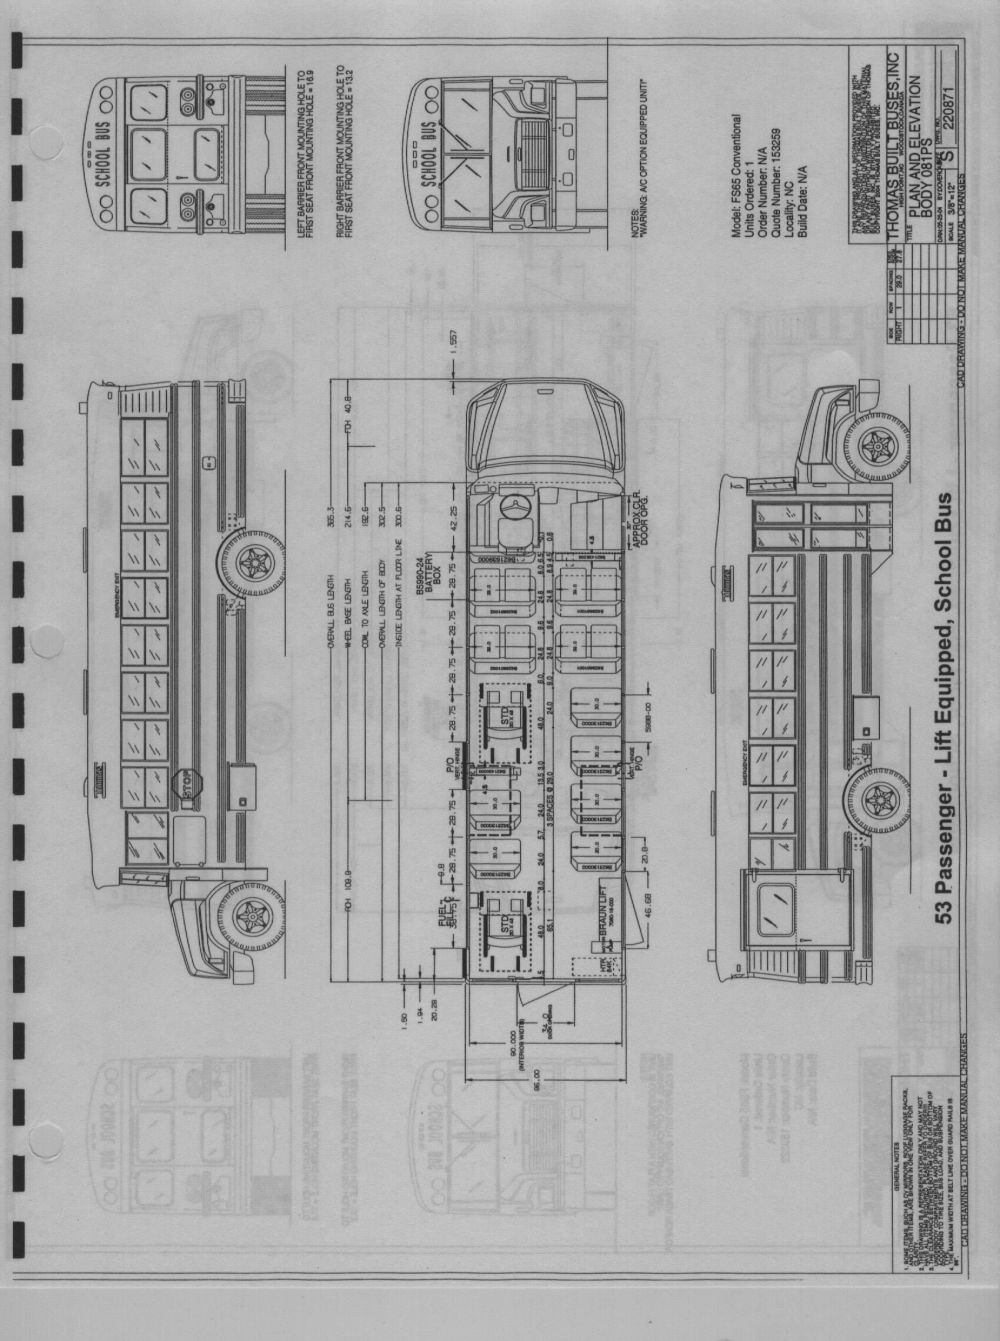 medium resolution of 2008 international school bu wiring diagram